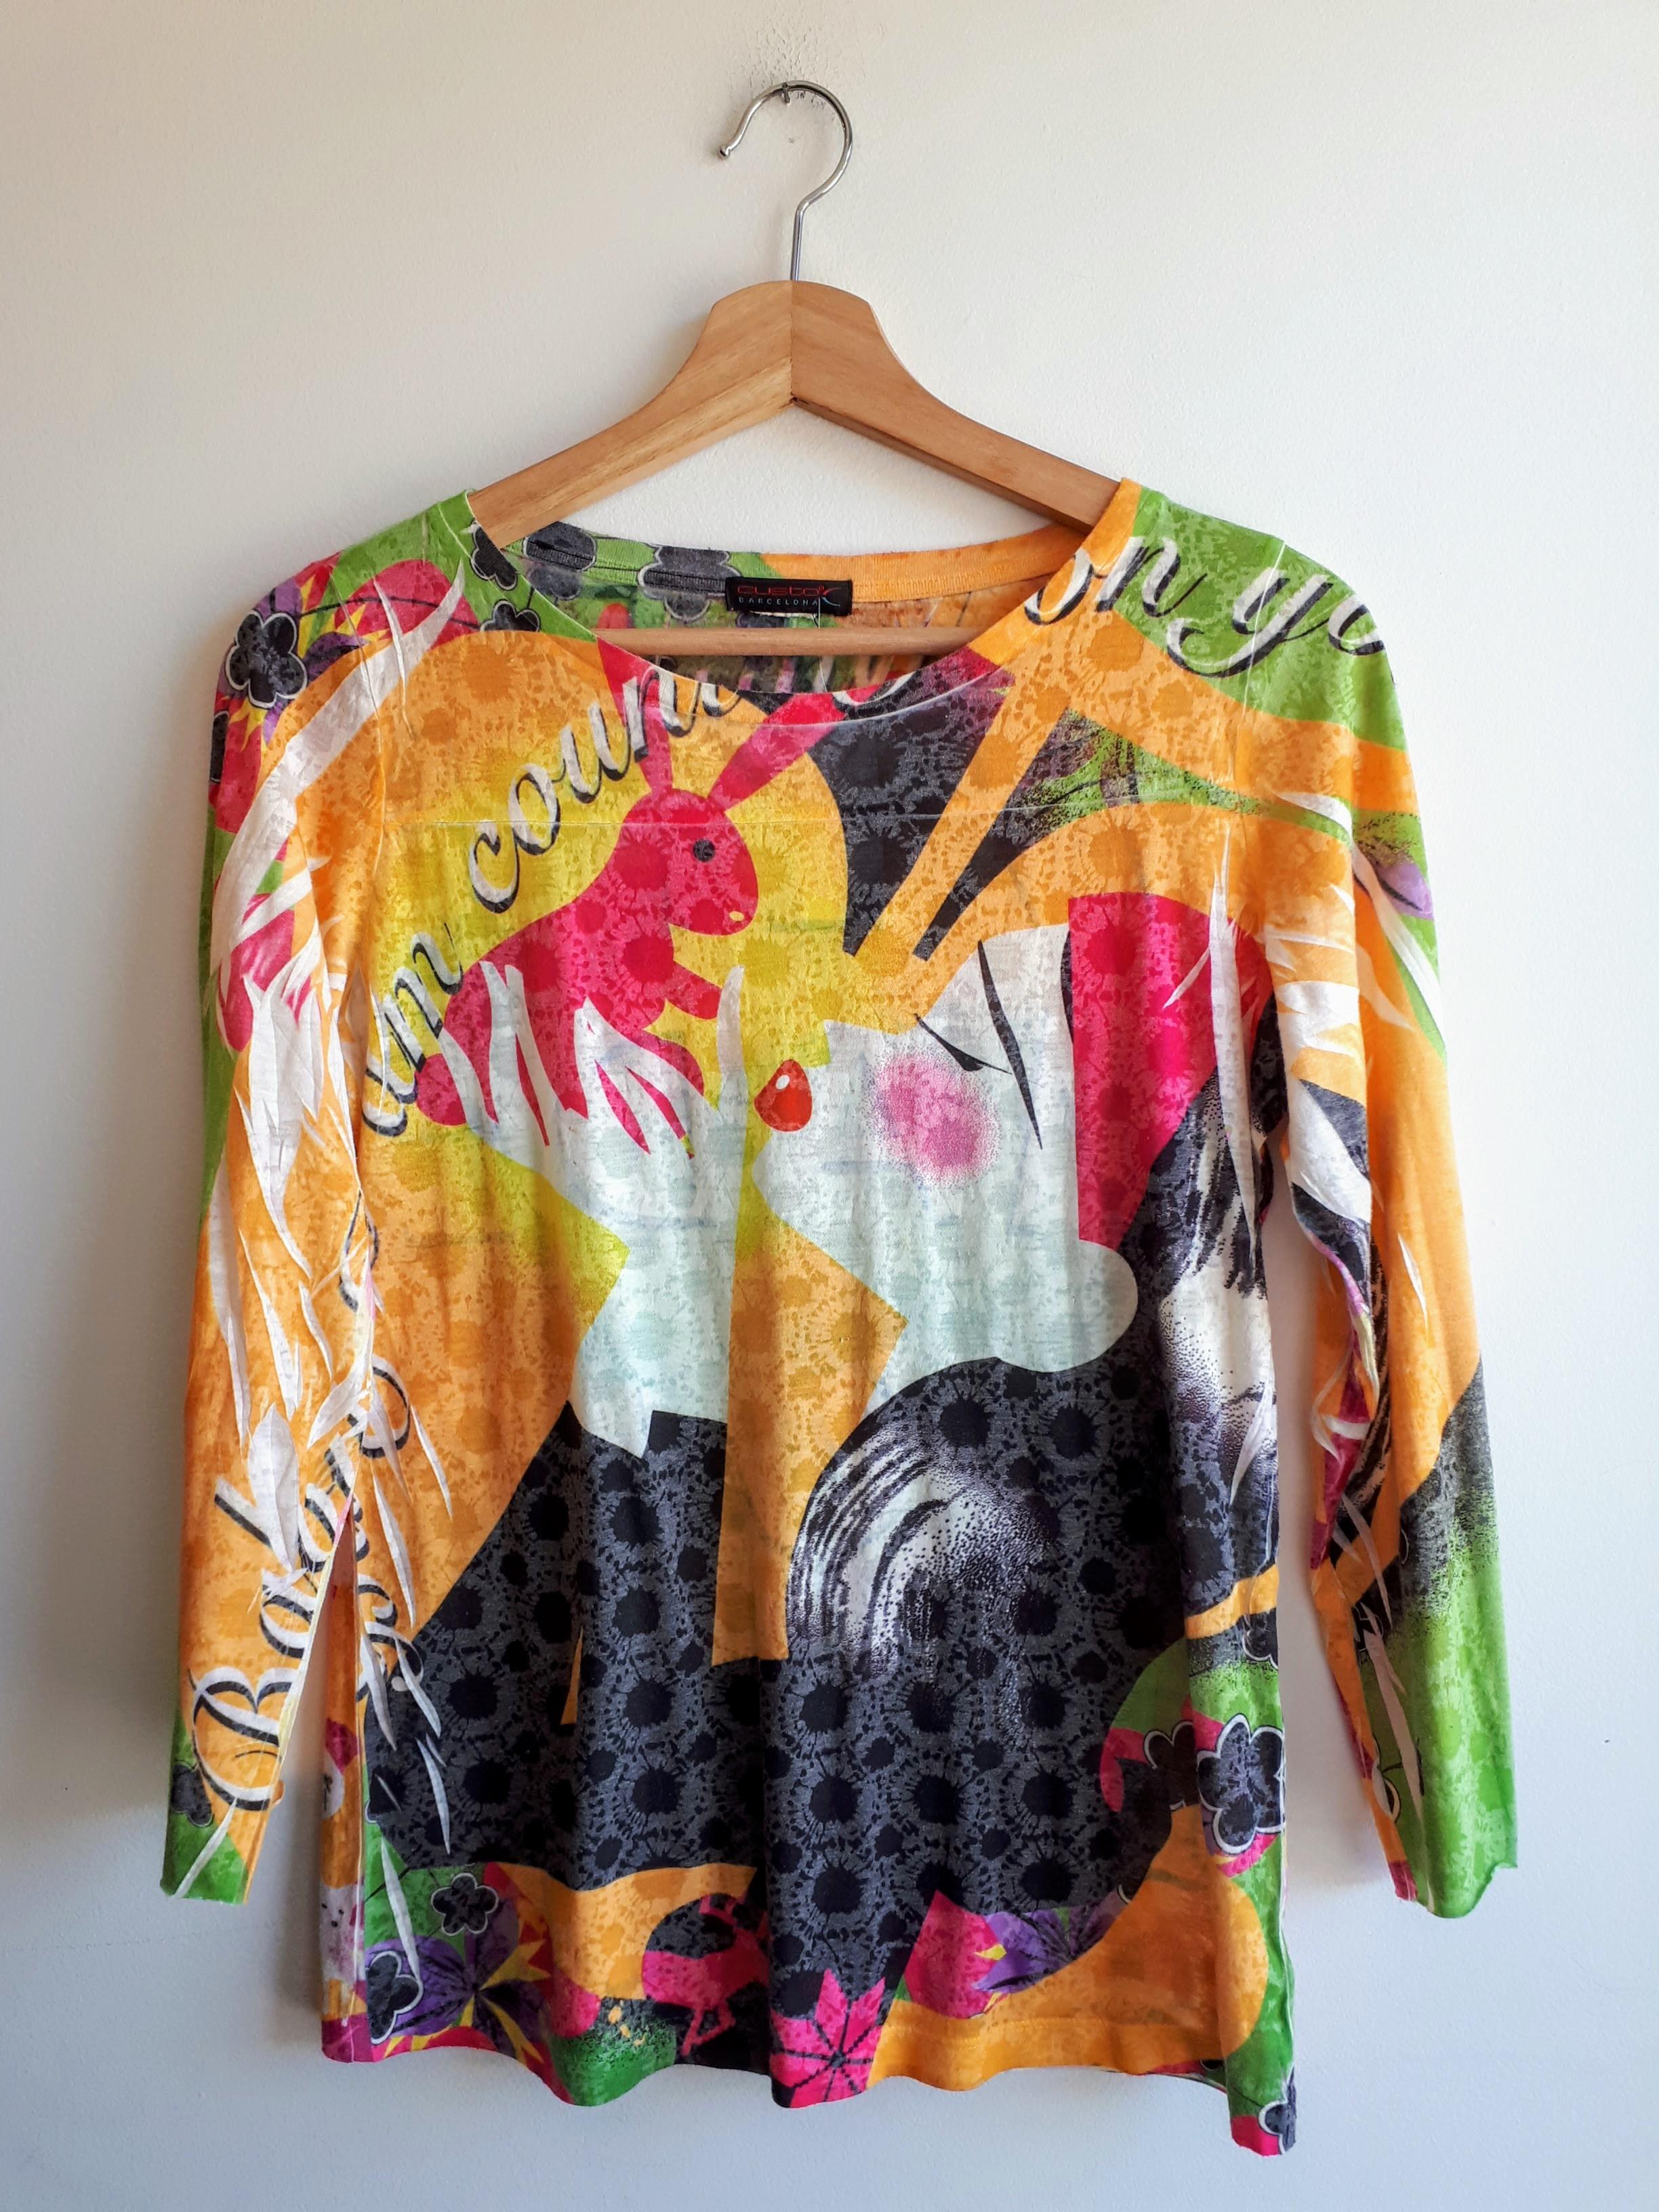 Custo Barcelona top; Size S, $26